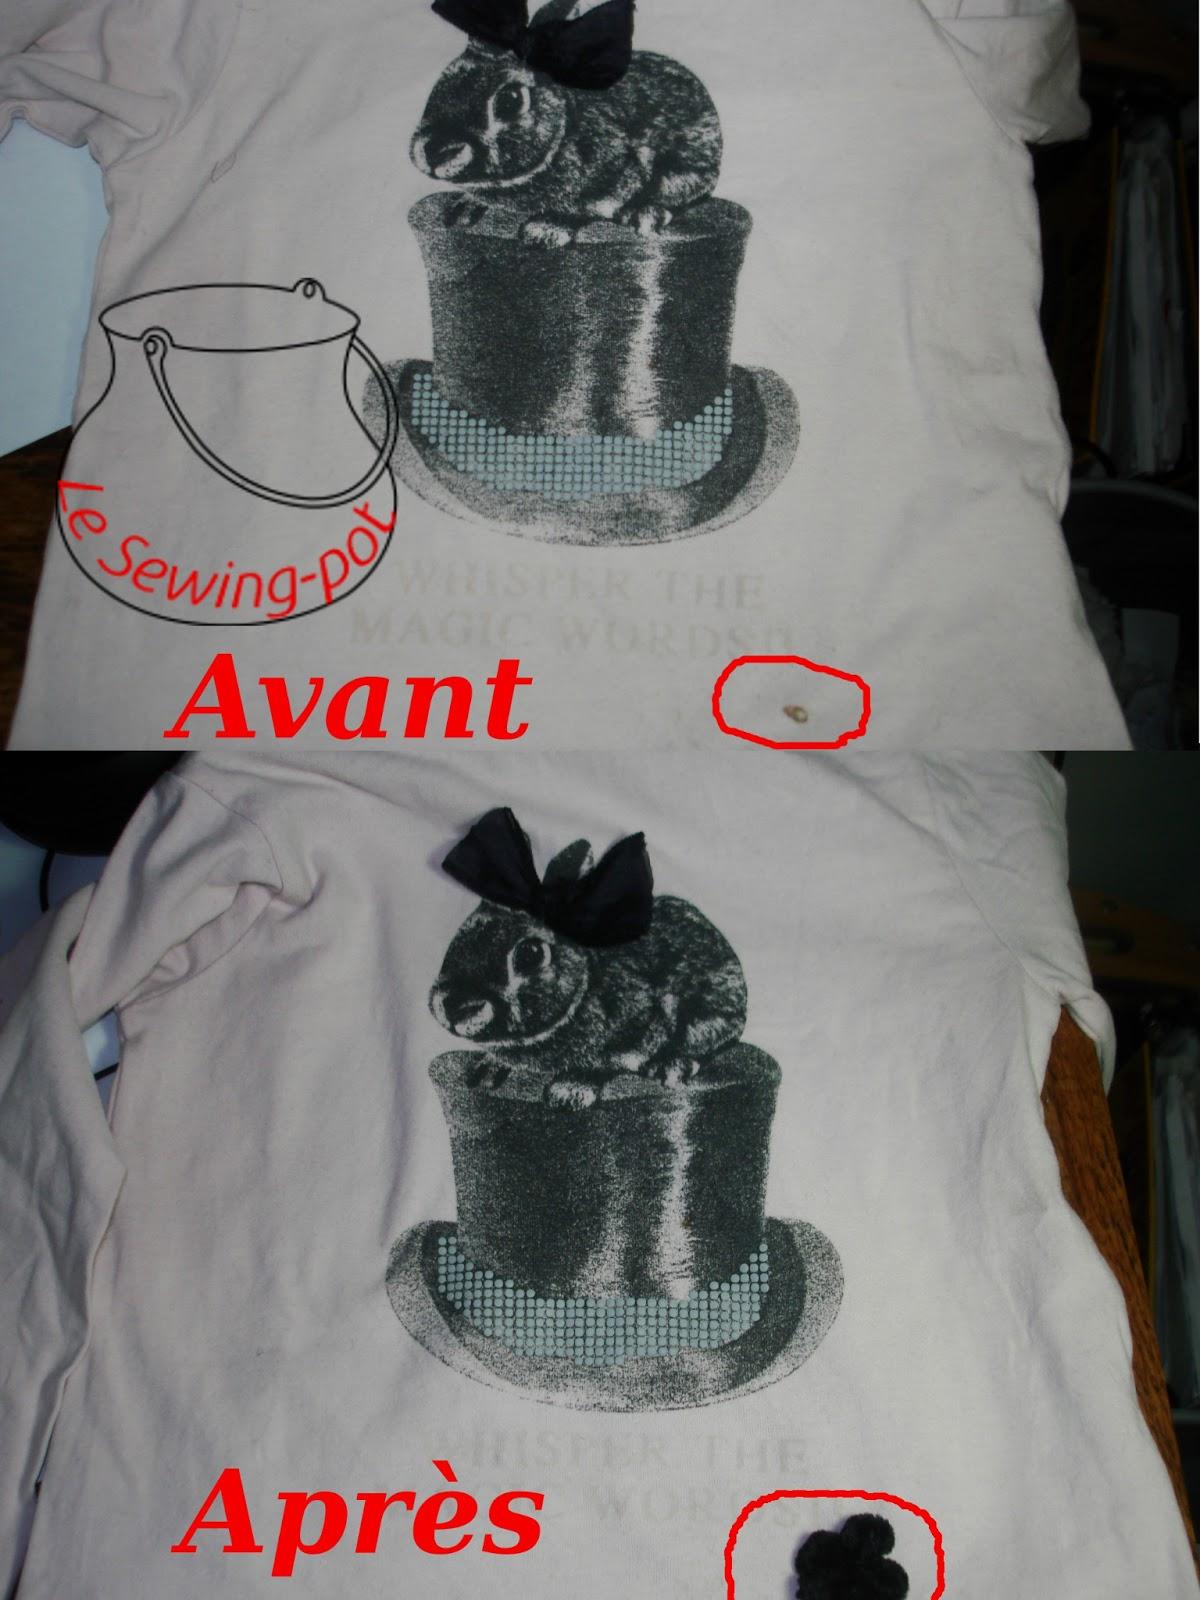 recyclage t-shirt tache